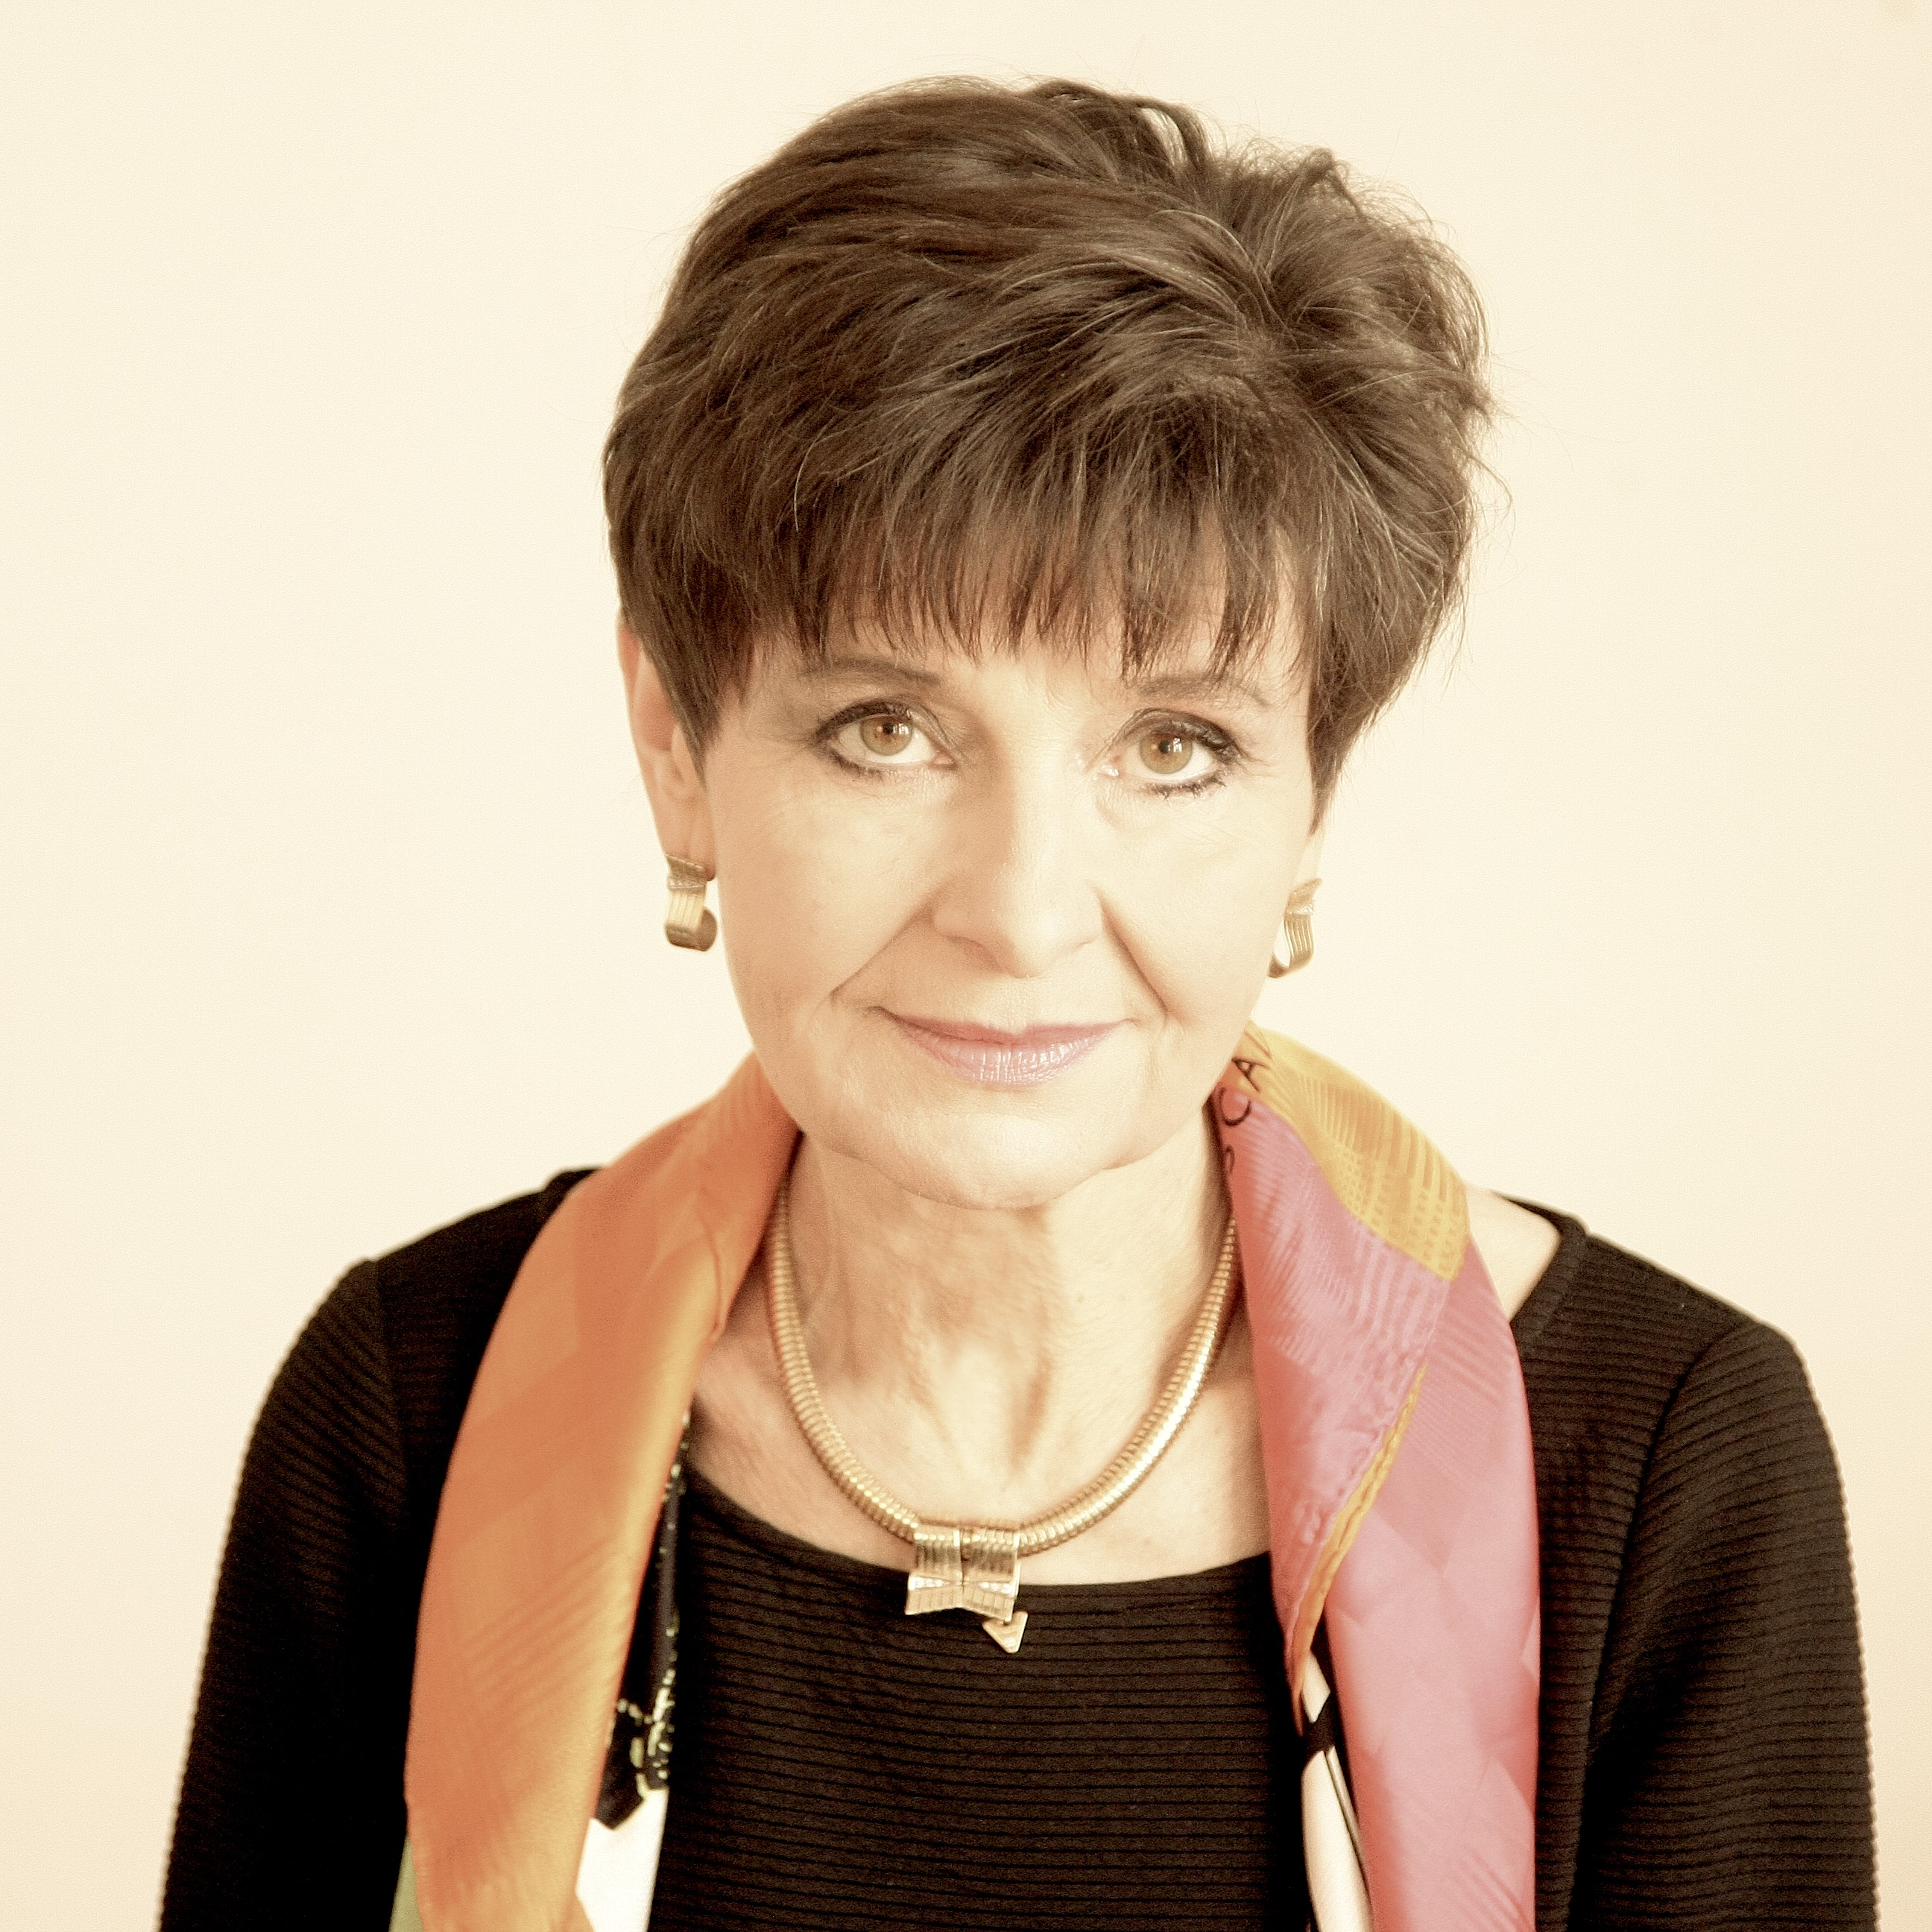 Univ.-Prof. Dr. med. Andrea Berzlanovich